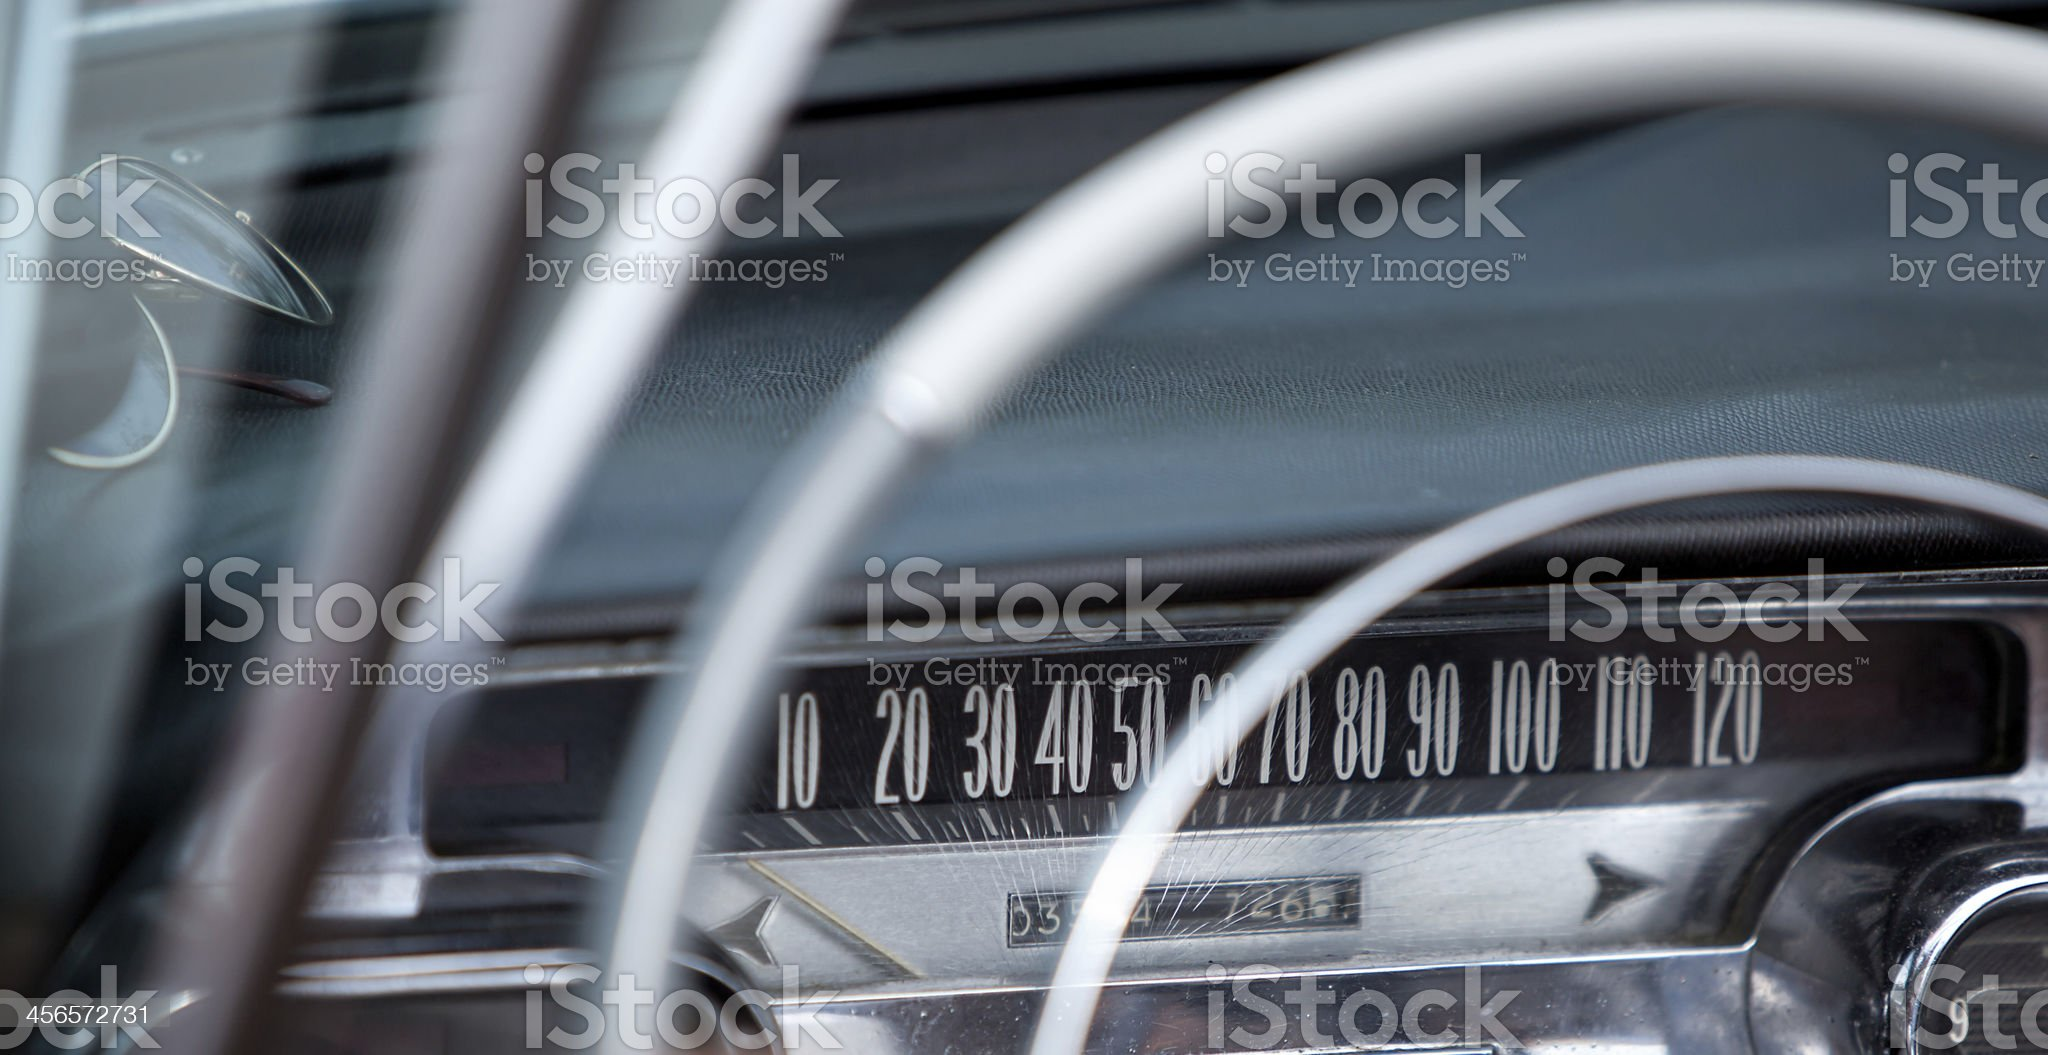 Vintage car control panel royalty-free stock photo